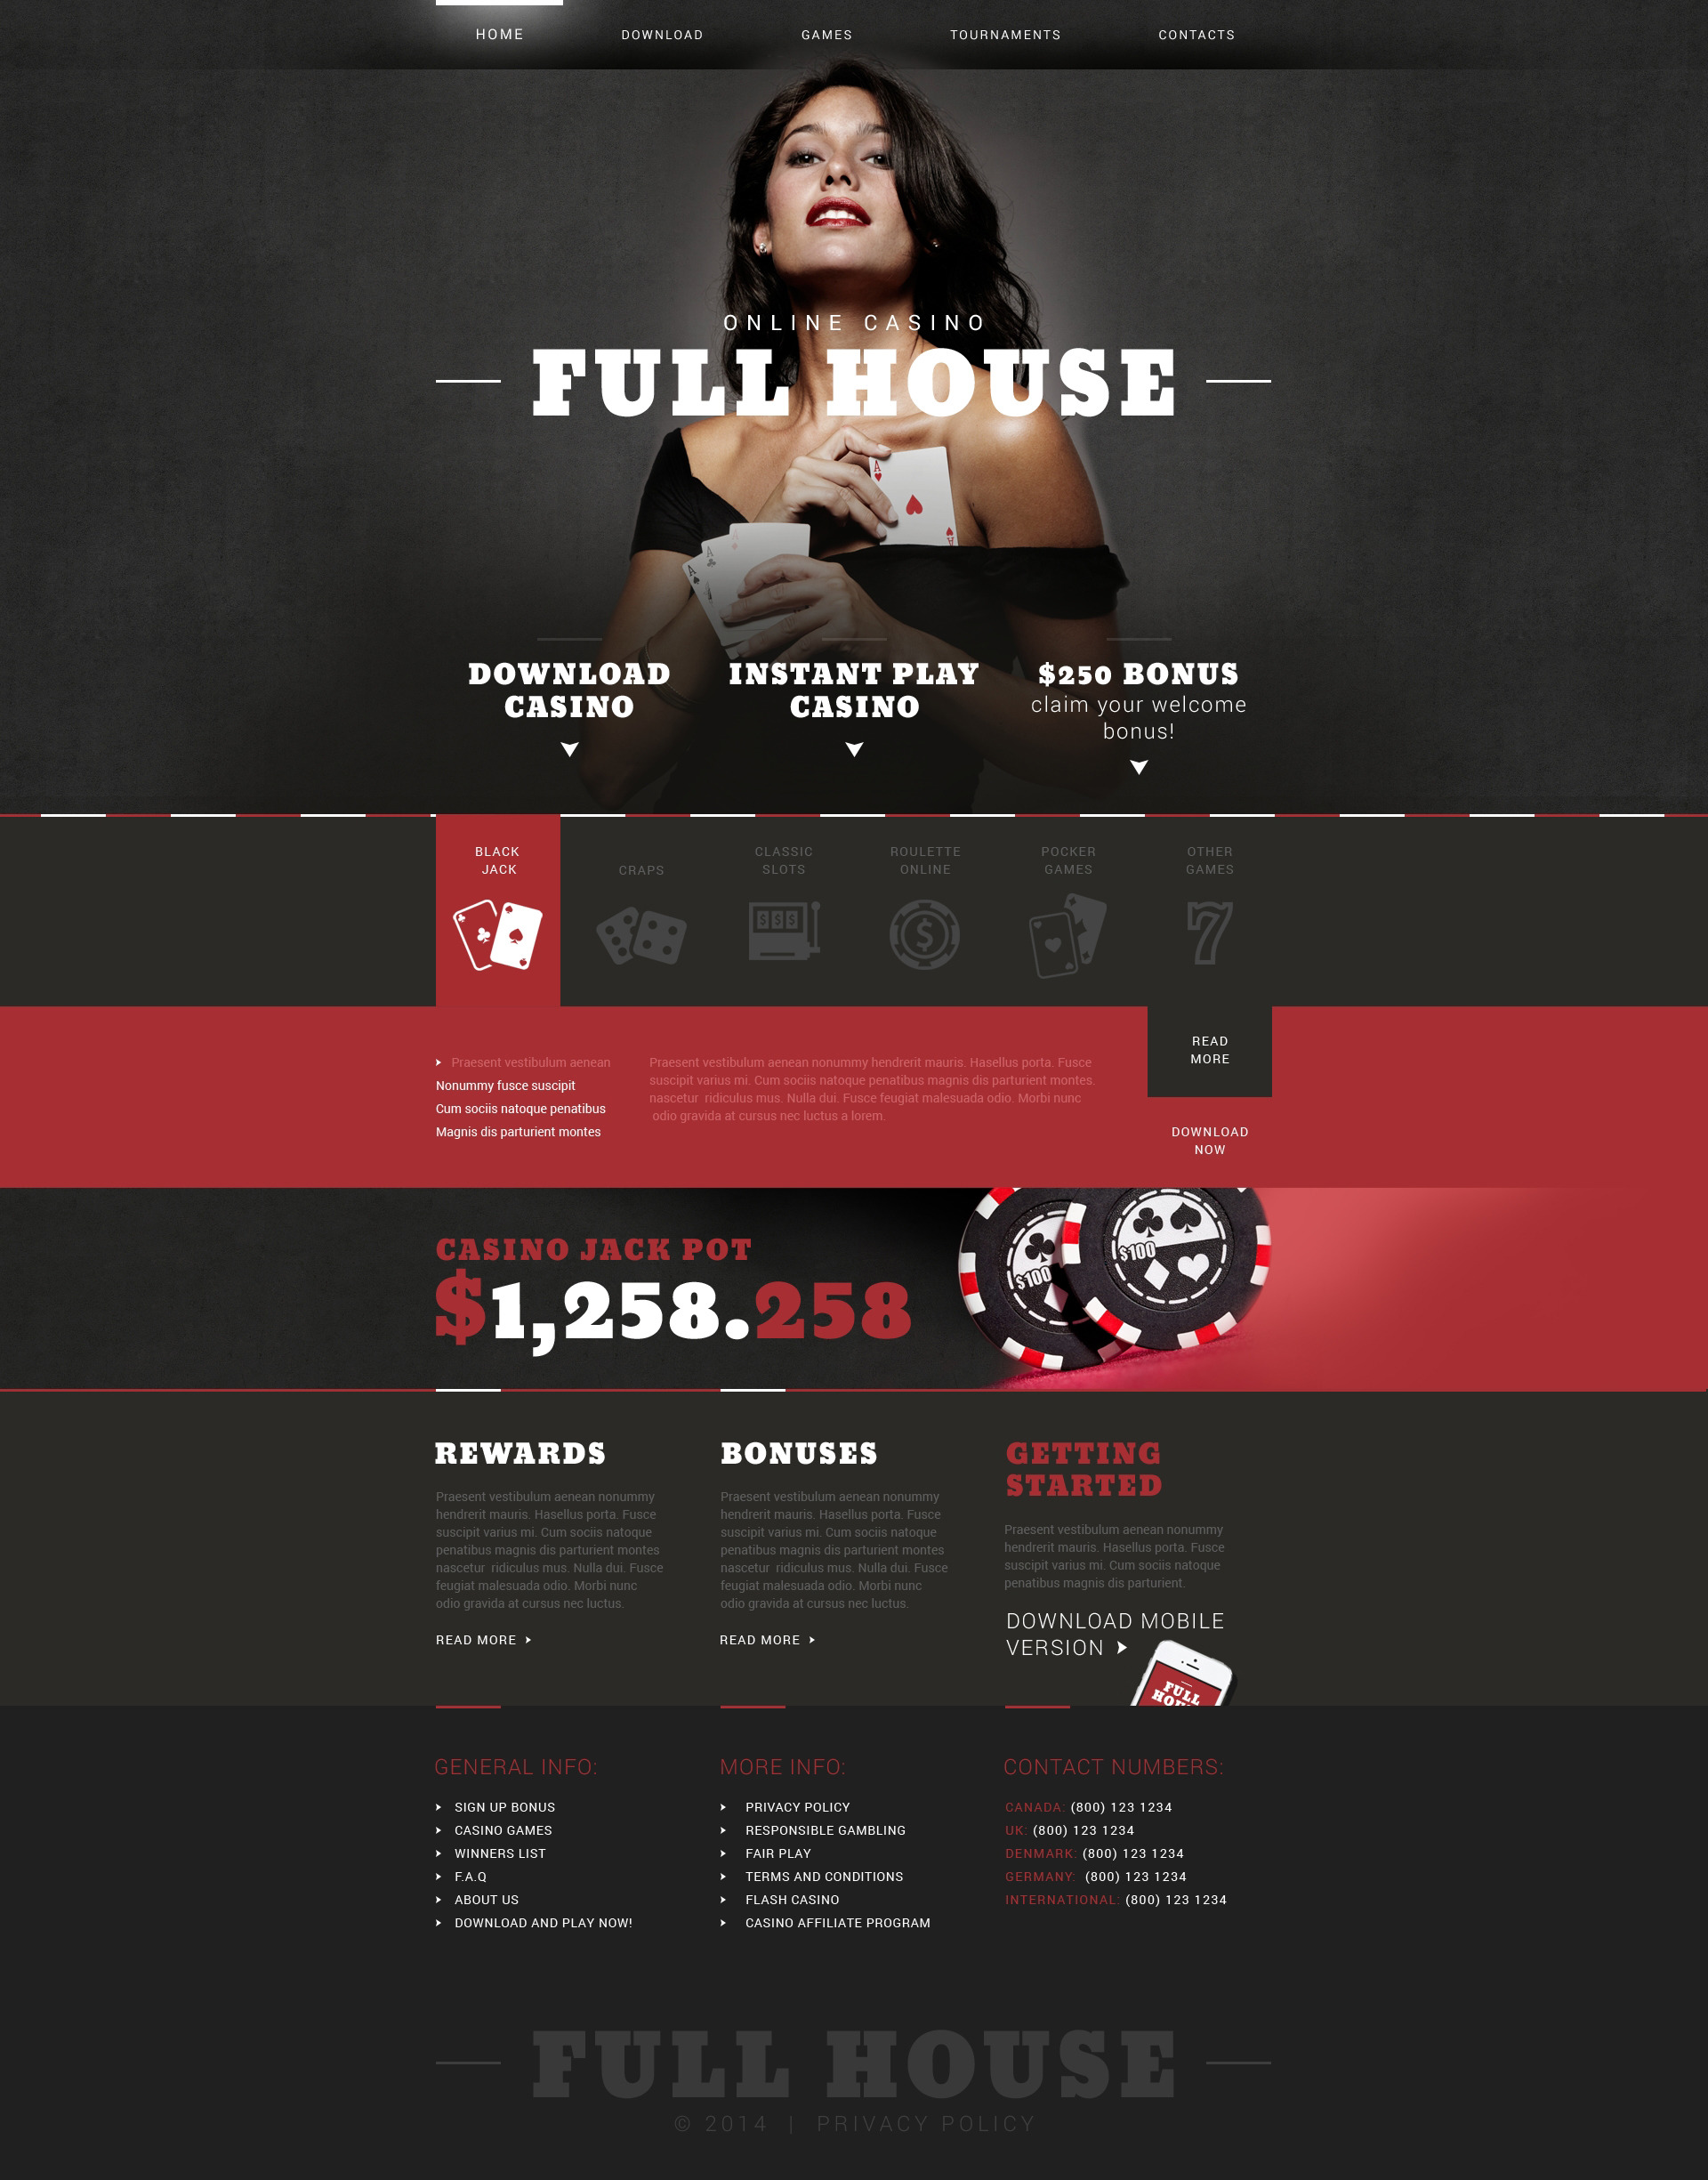 Advertise casino online site casino slots machine online